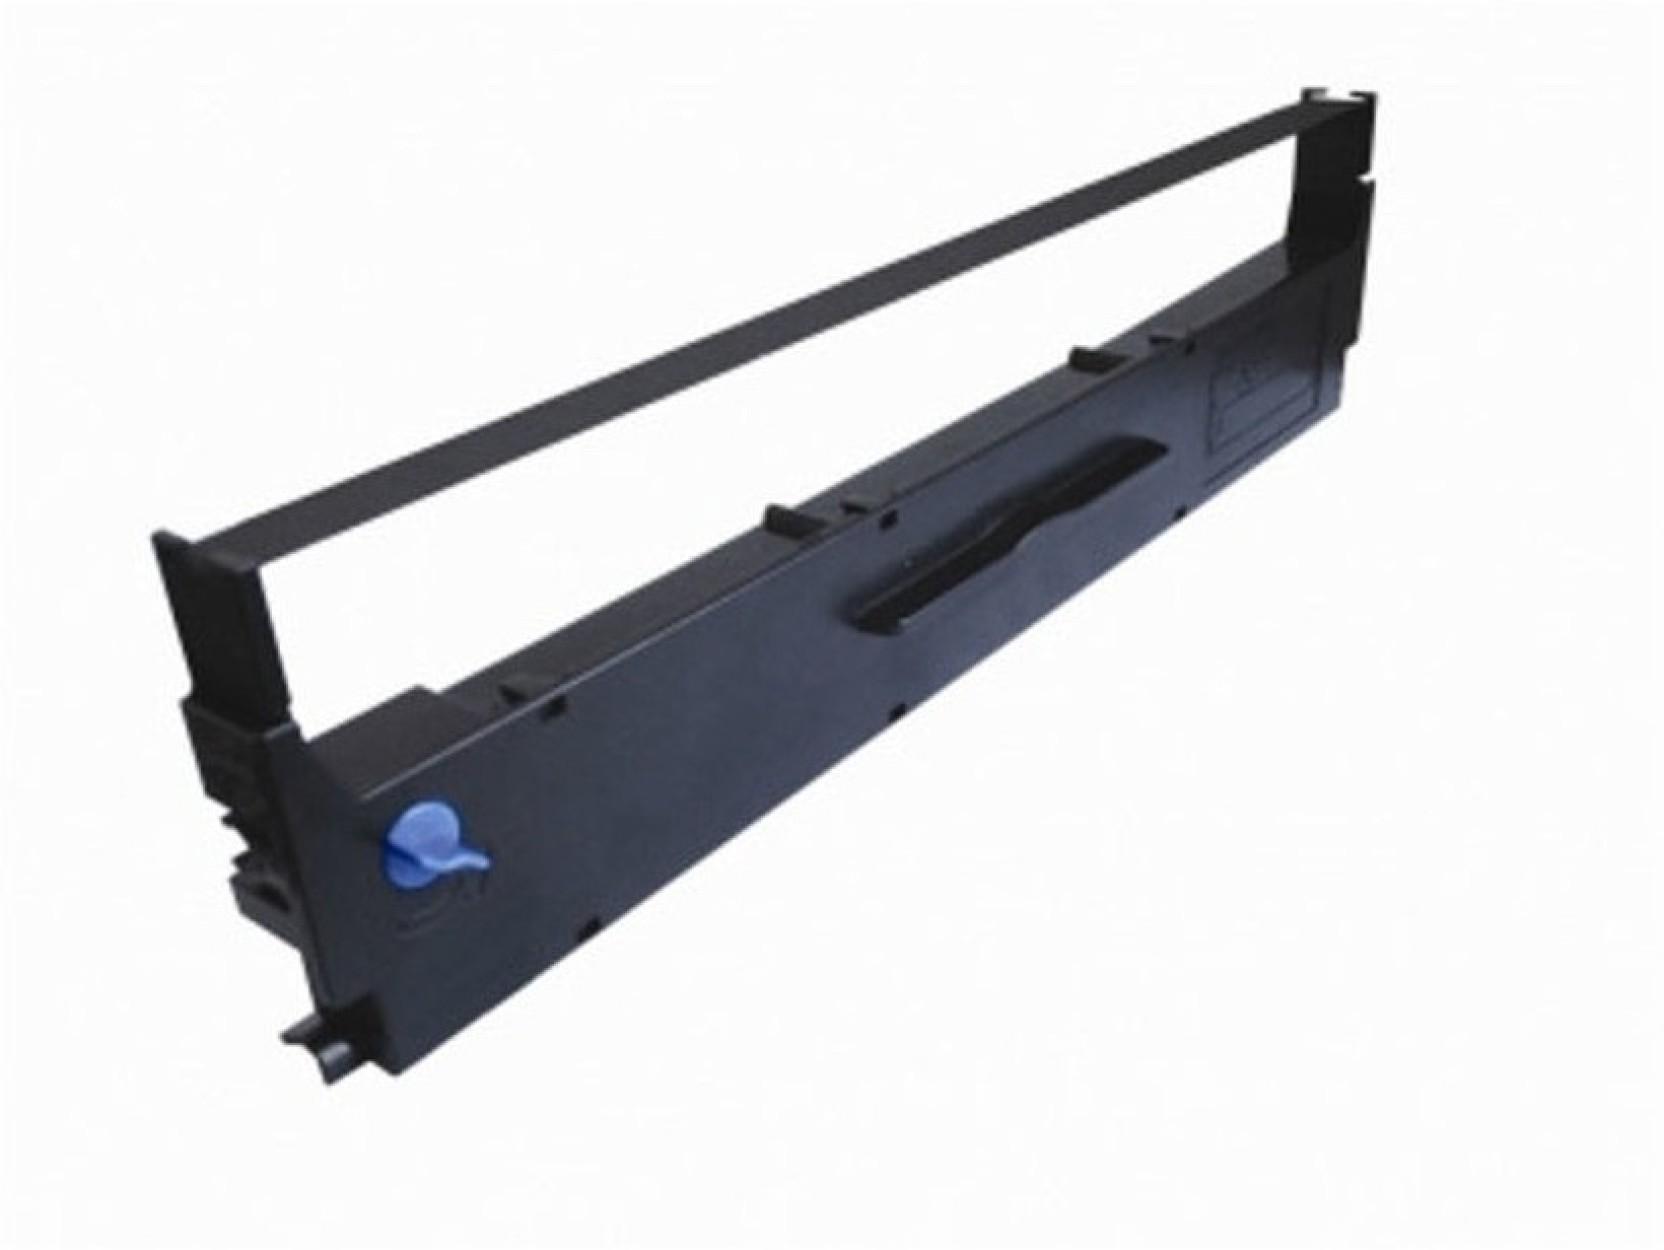 Prodot Epson Lq 310 Compatible Dmp Ribbon Cartridge For Dotmatrix Carriage Unit Lx310 Original New Add To Cart